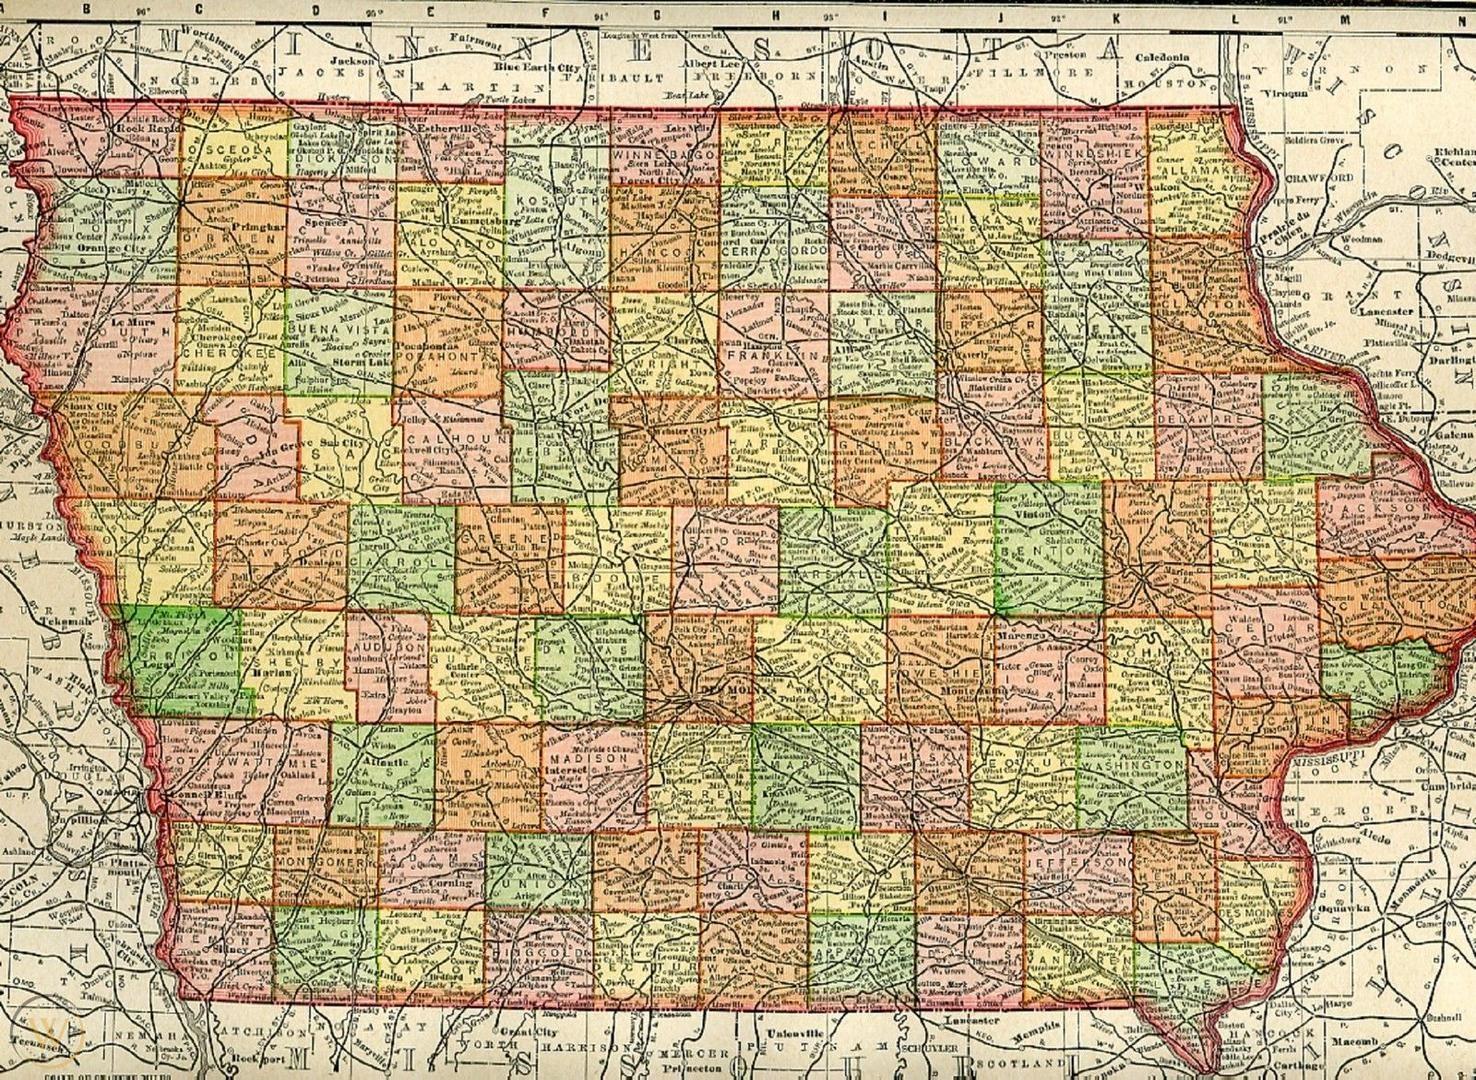 The Iowa Locator